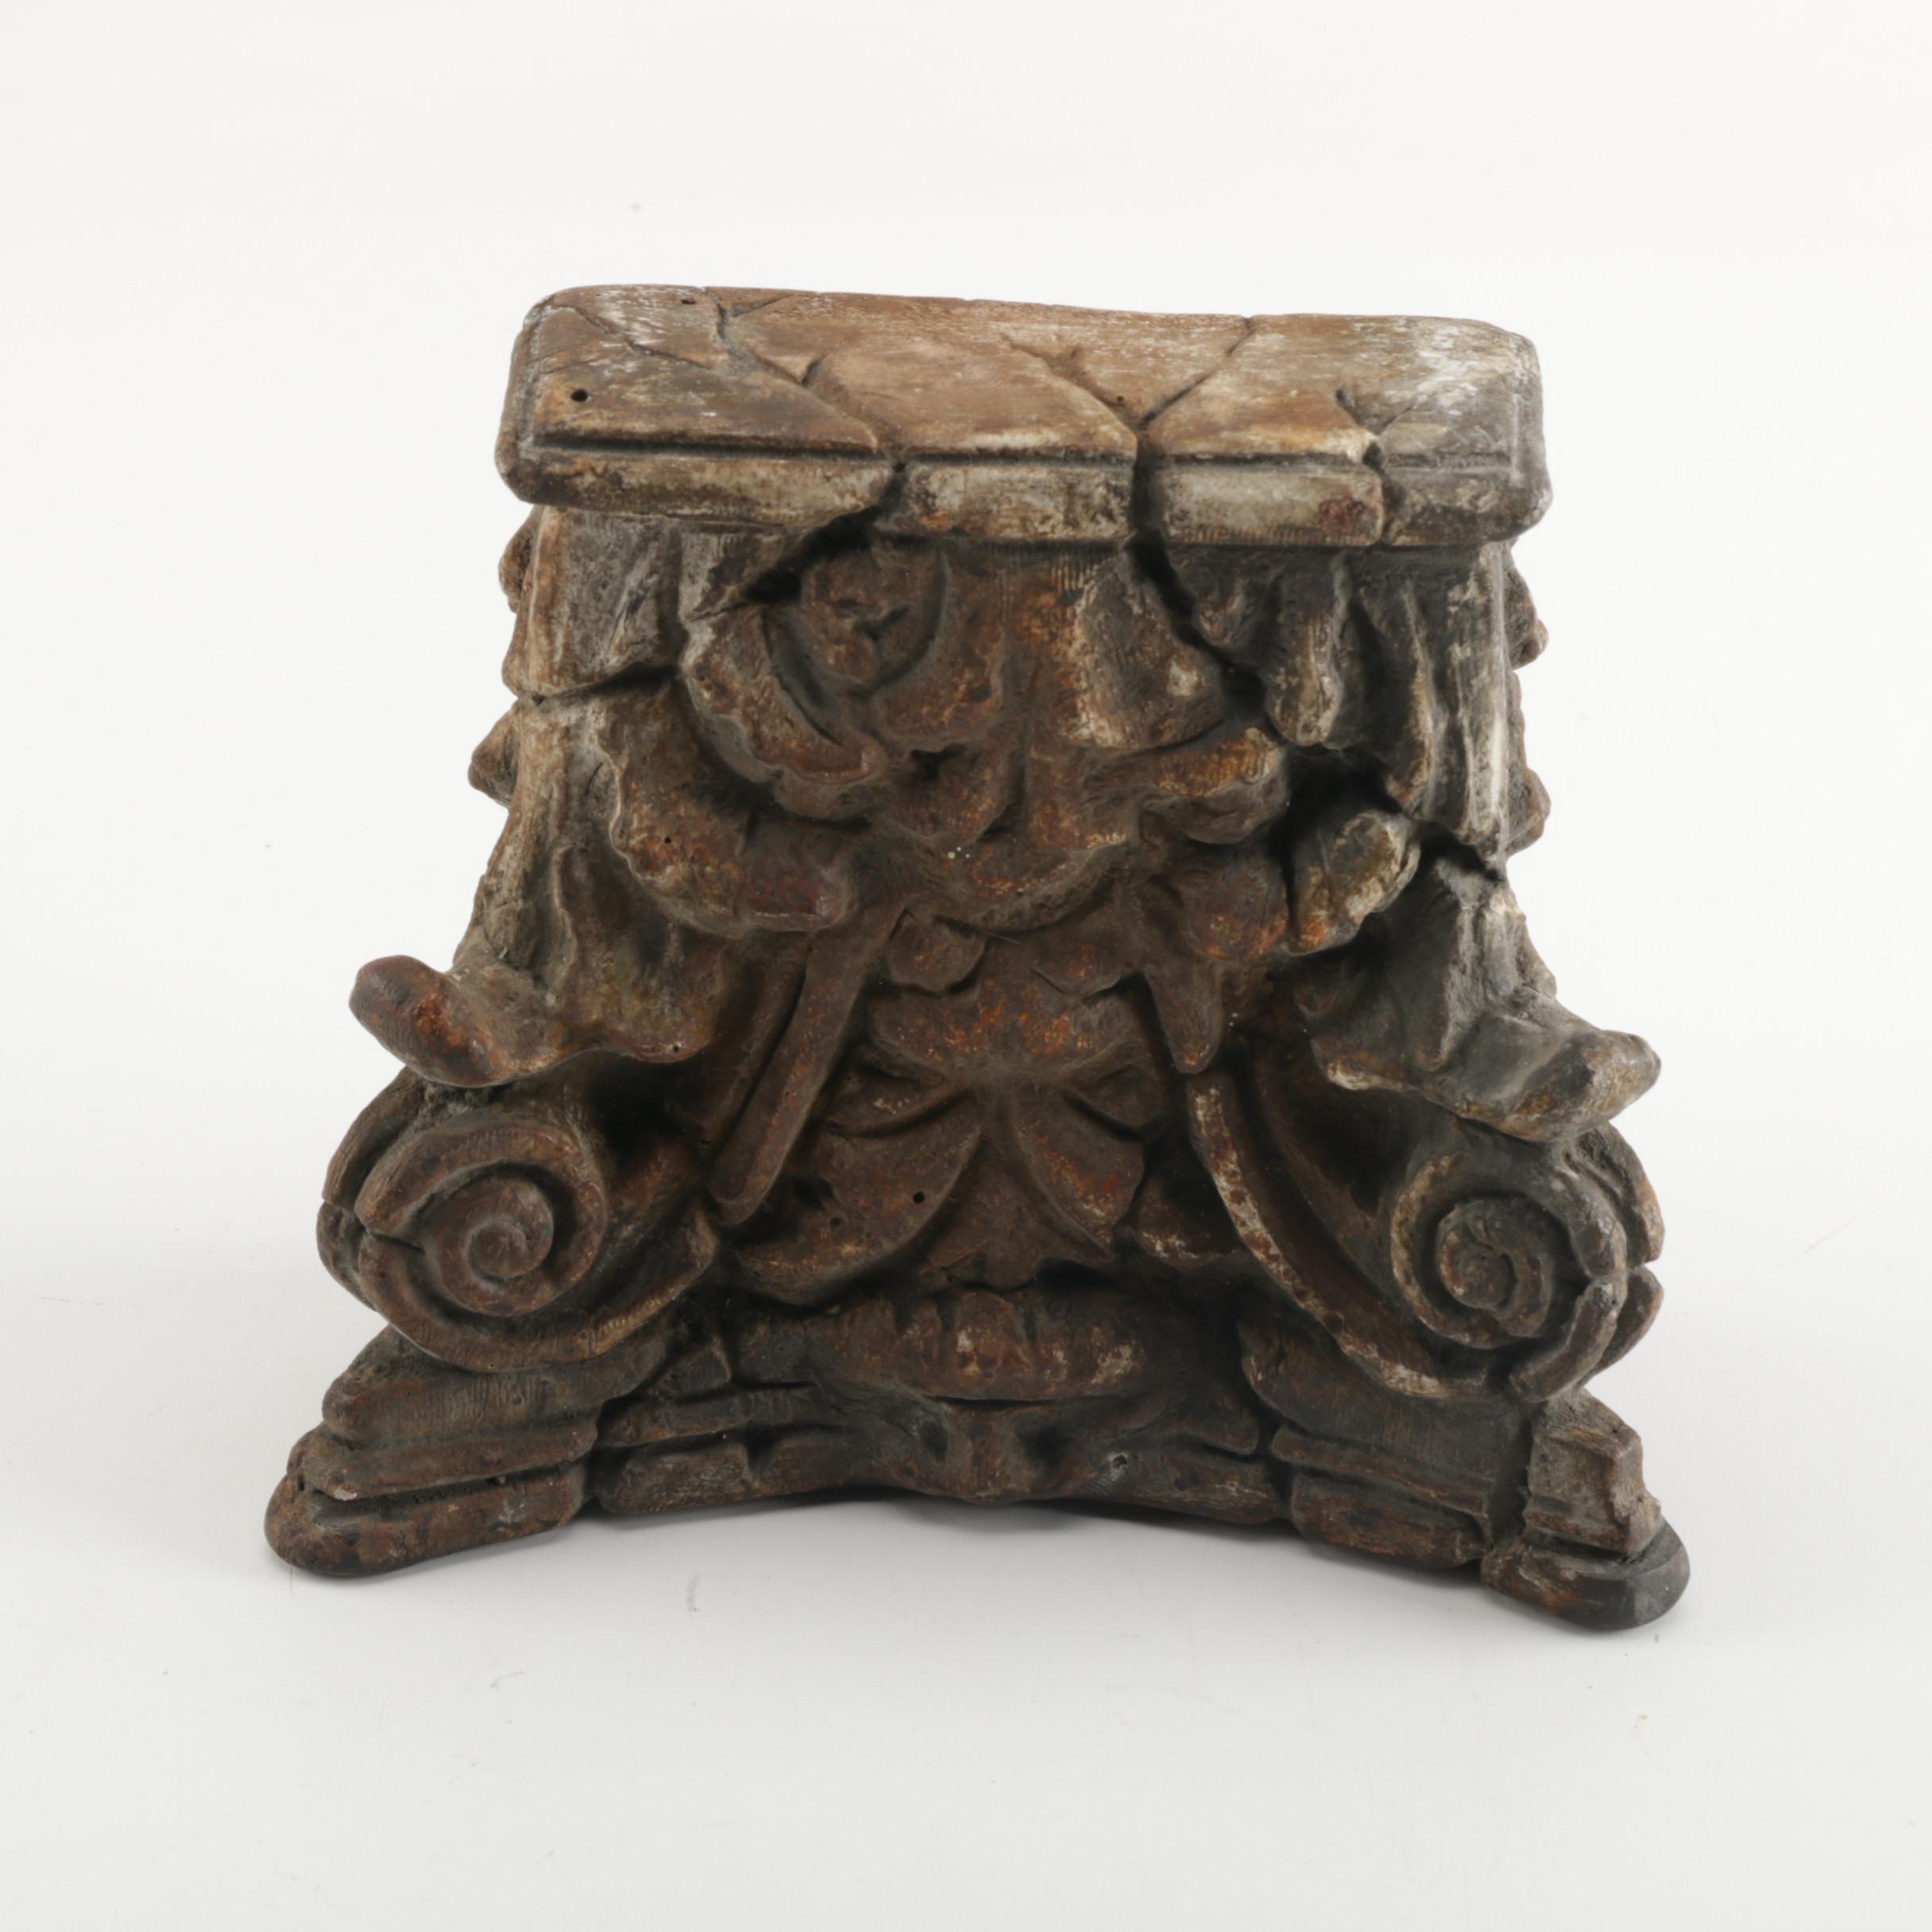 Attila's Reproduction Resin Sculpture